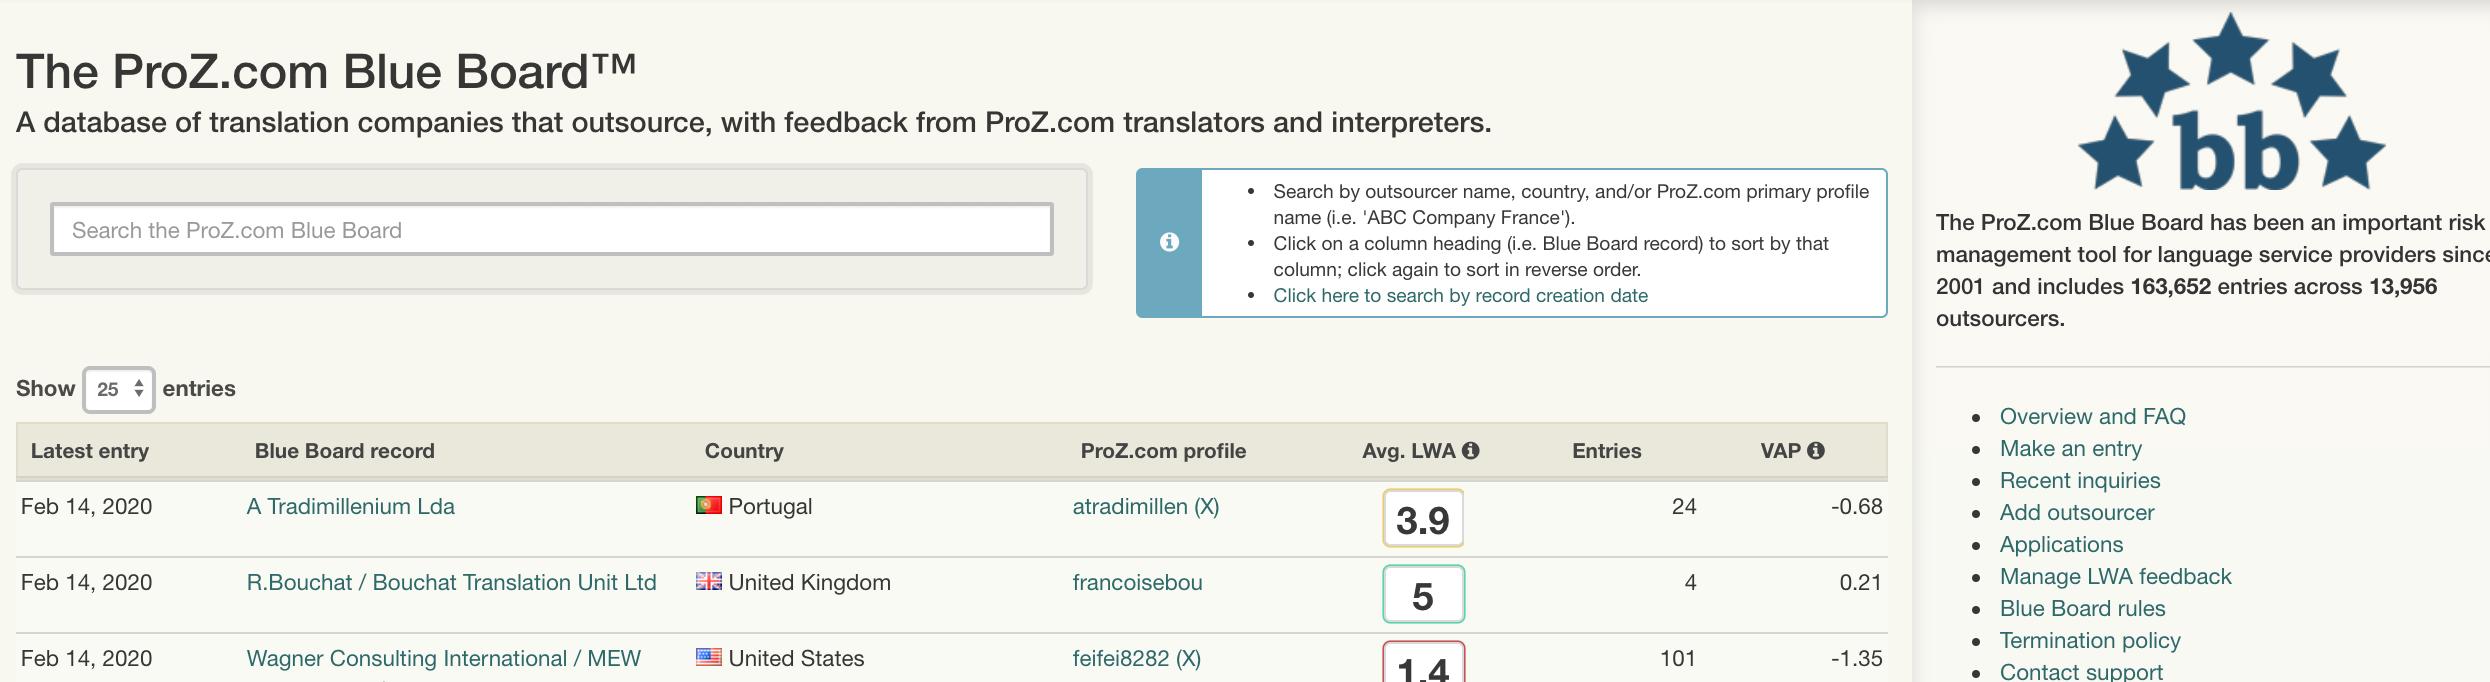 The ProZ.com Blue Board